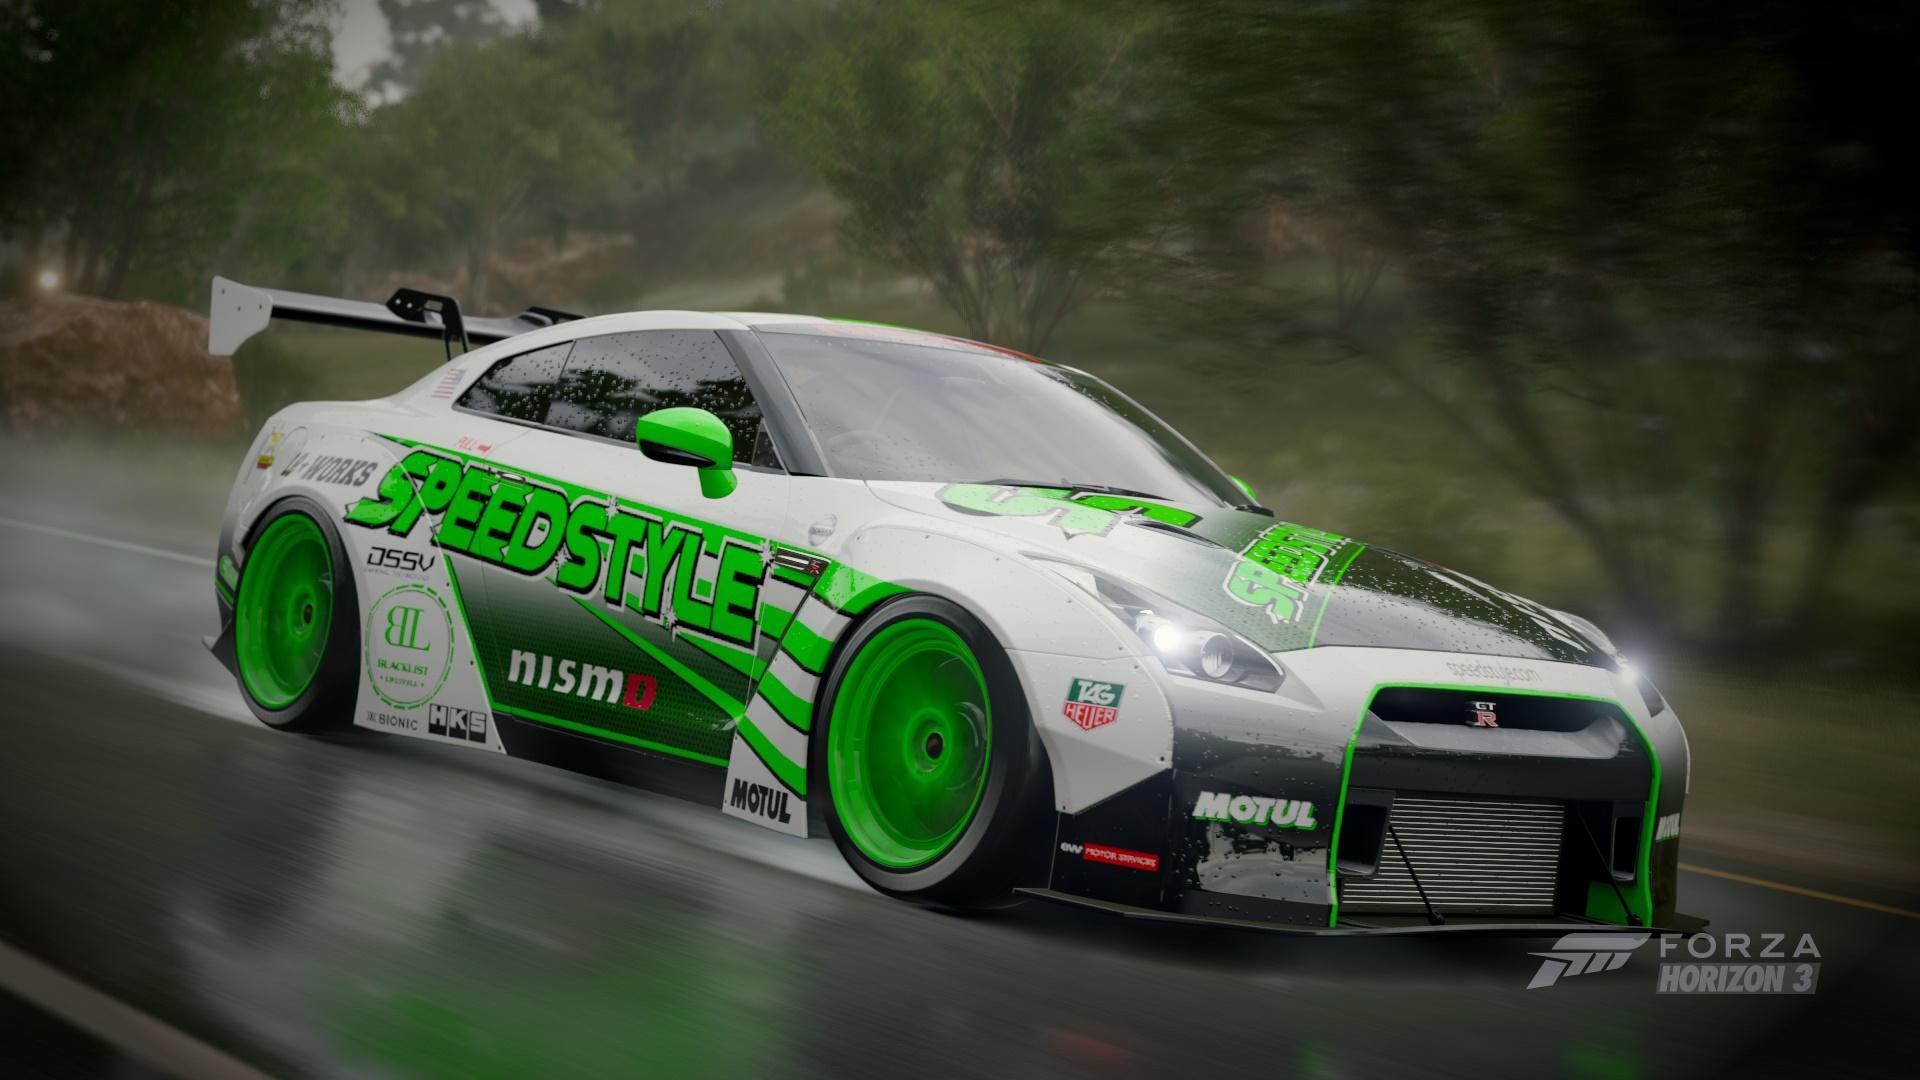 Forza Horizon 3 Livery Contests - 1 - Contest Archive - Forza ...